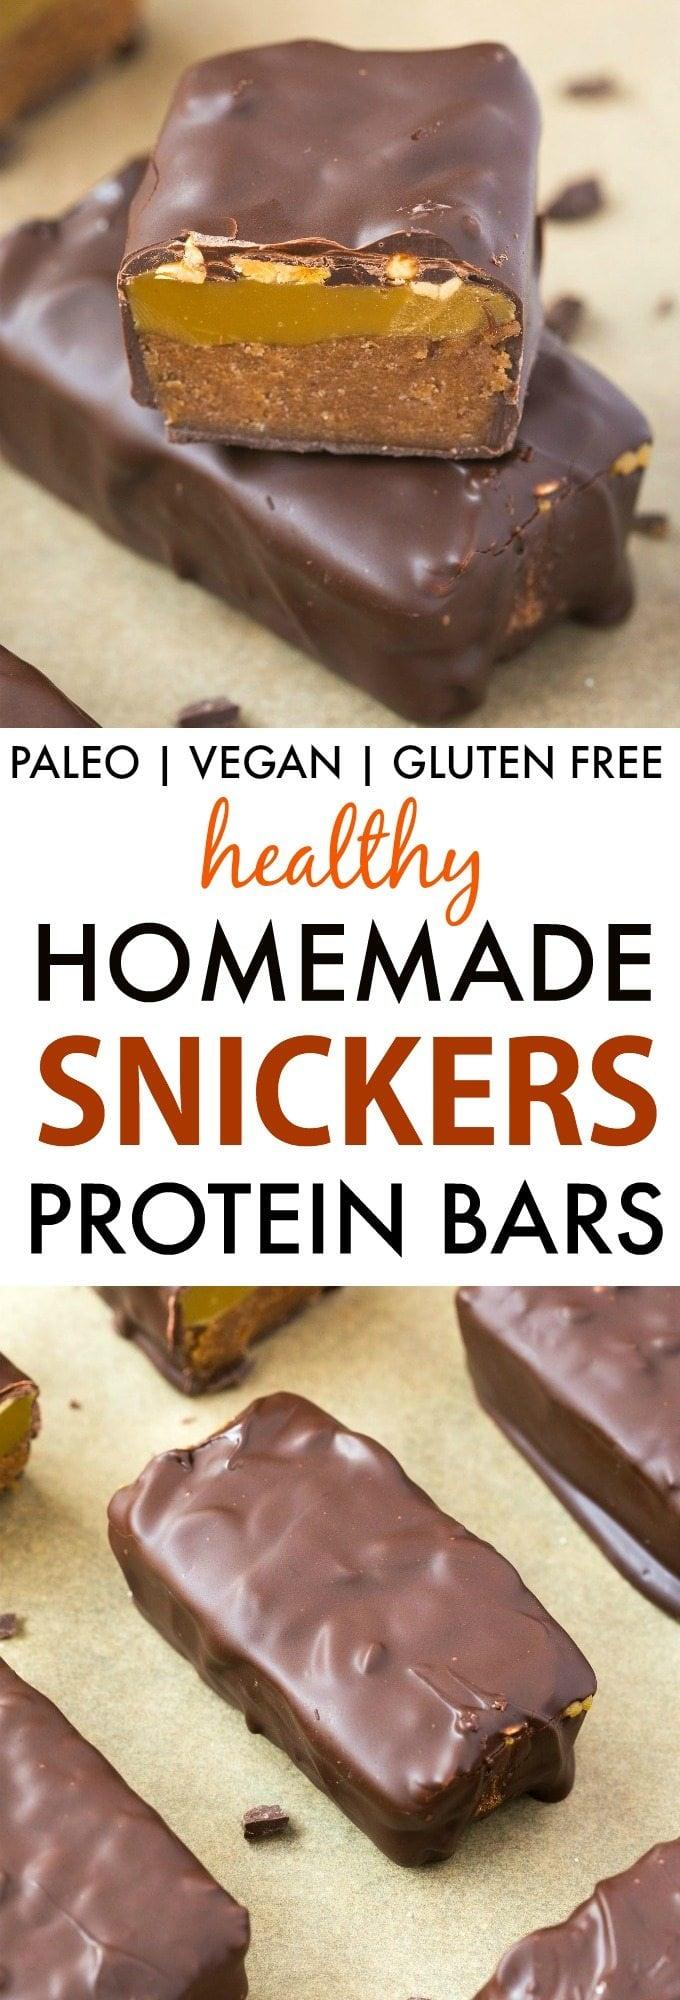 healthy homemade snickers protein bars paleo vegan gluten free